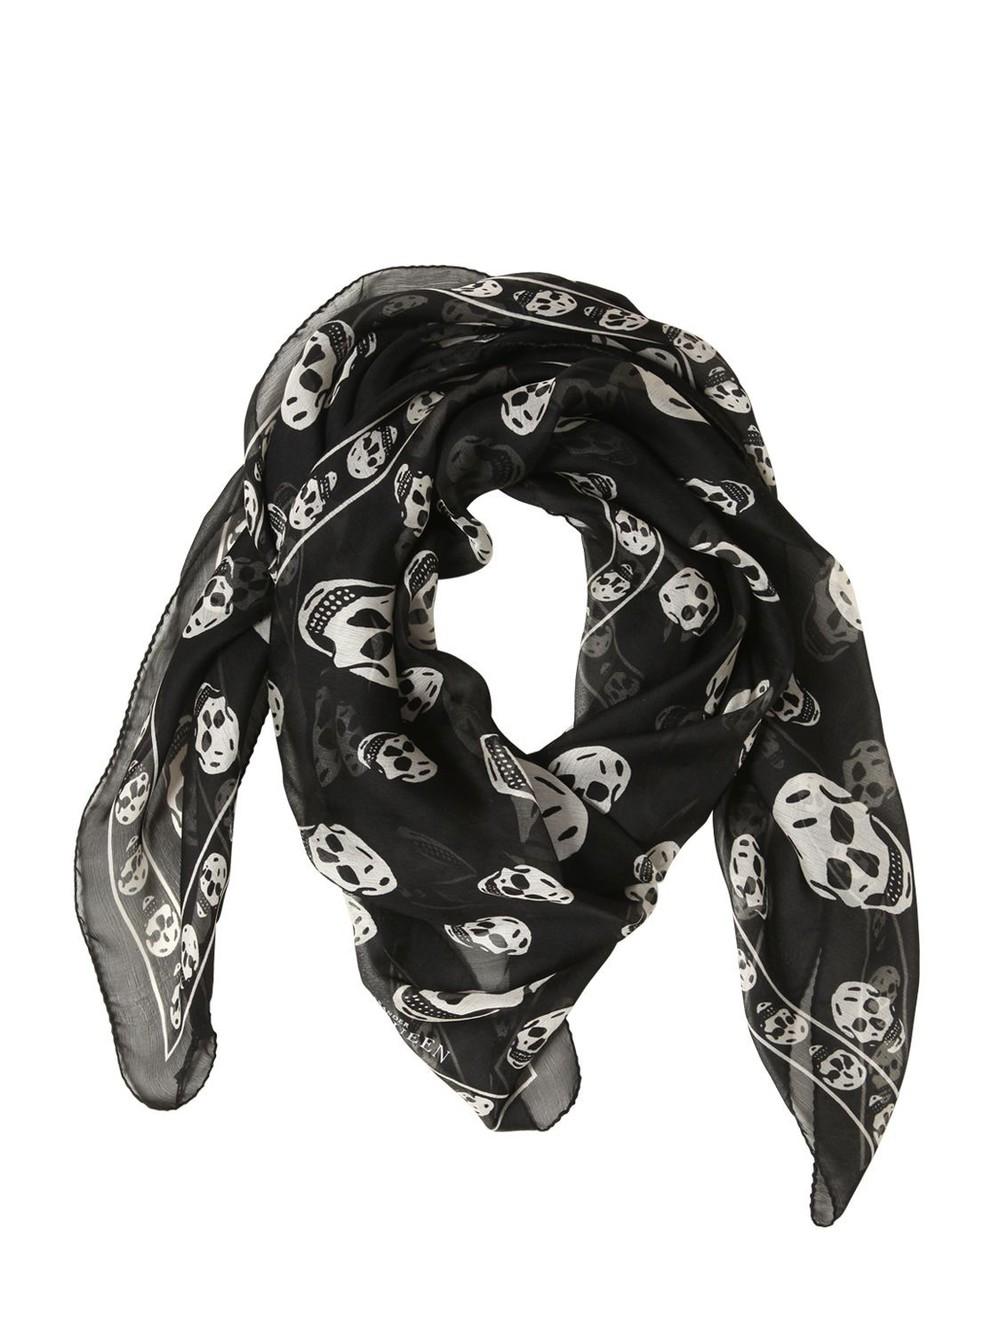 a35f6f693 ALEXANDER MCQUEEN Skull Printed Silk Chiffon Scarf in black / white